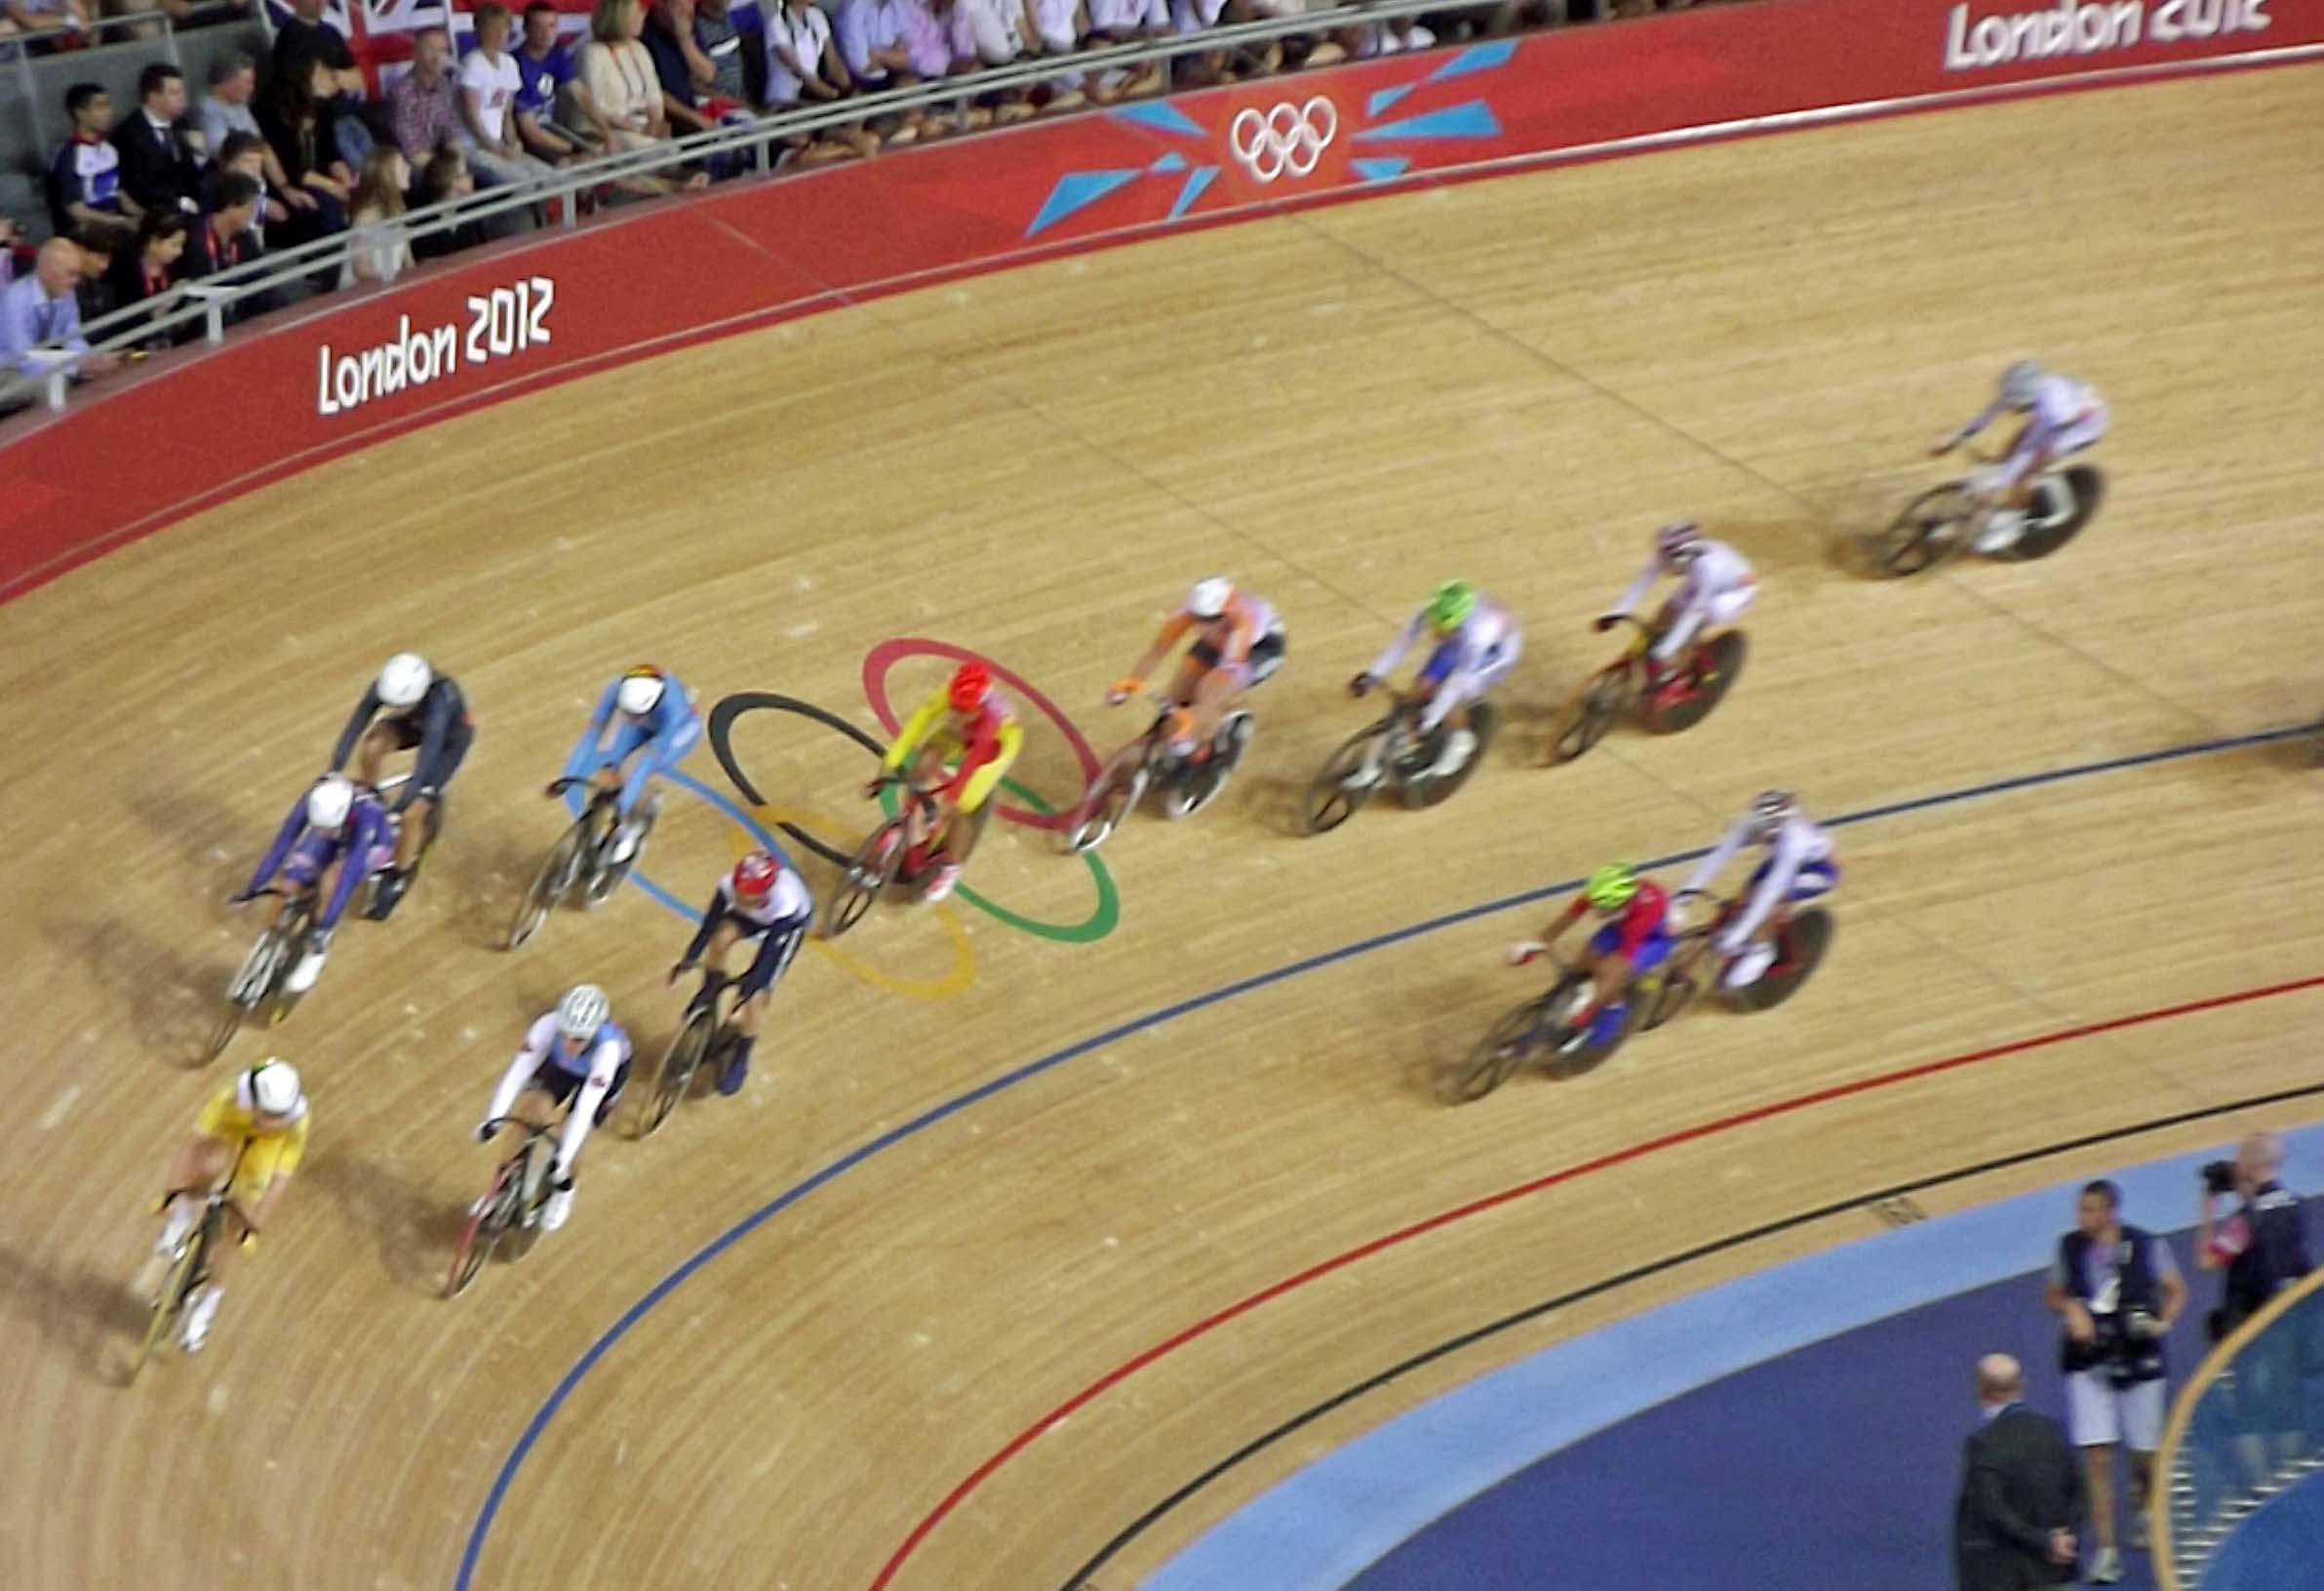 Cyclists on a track